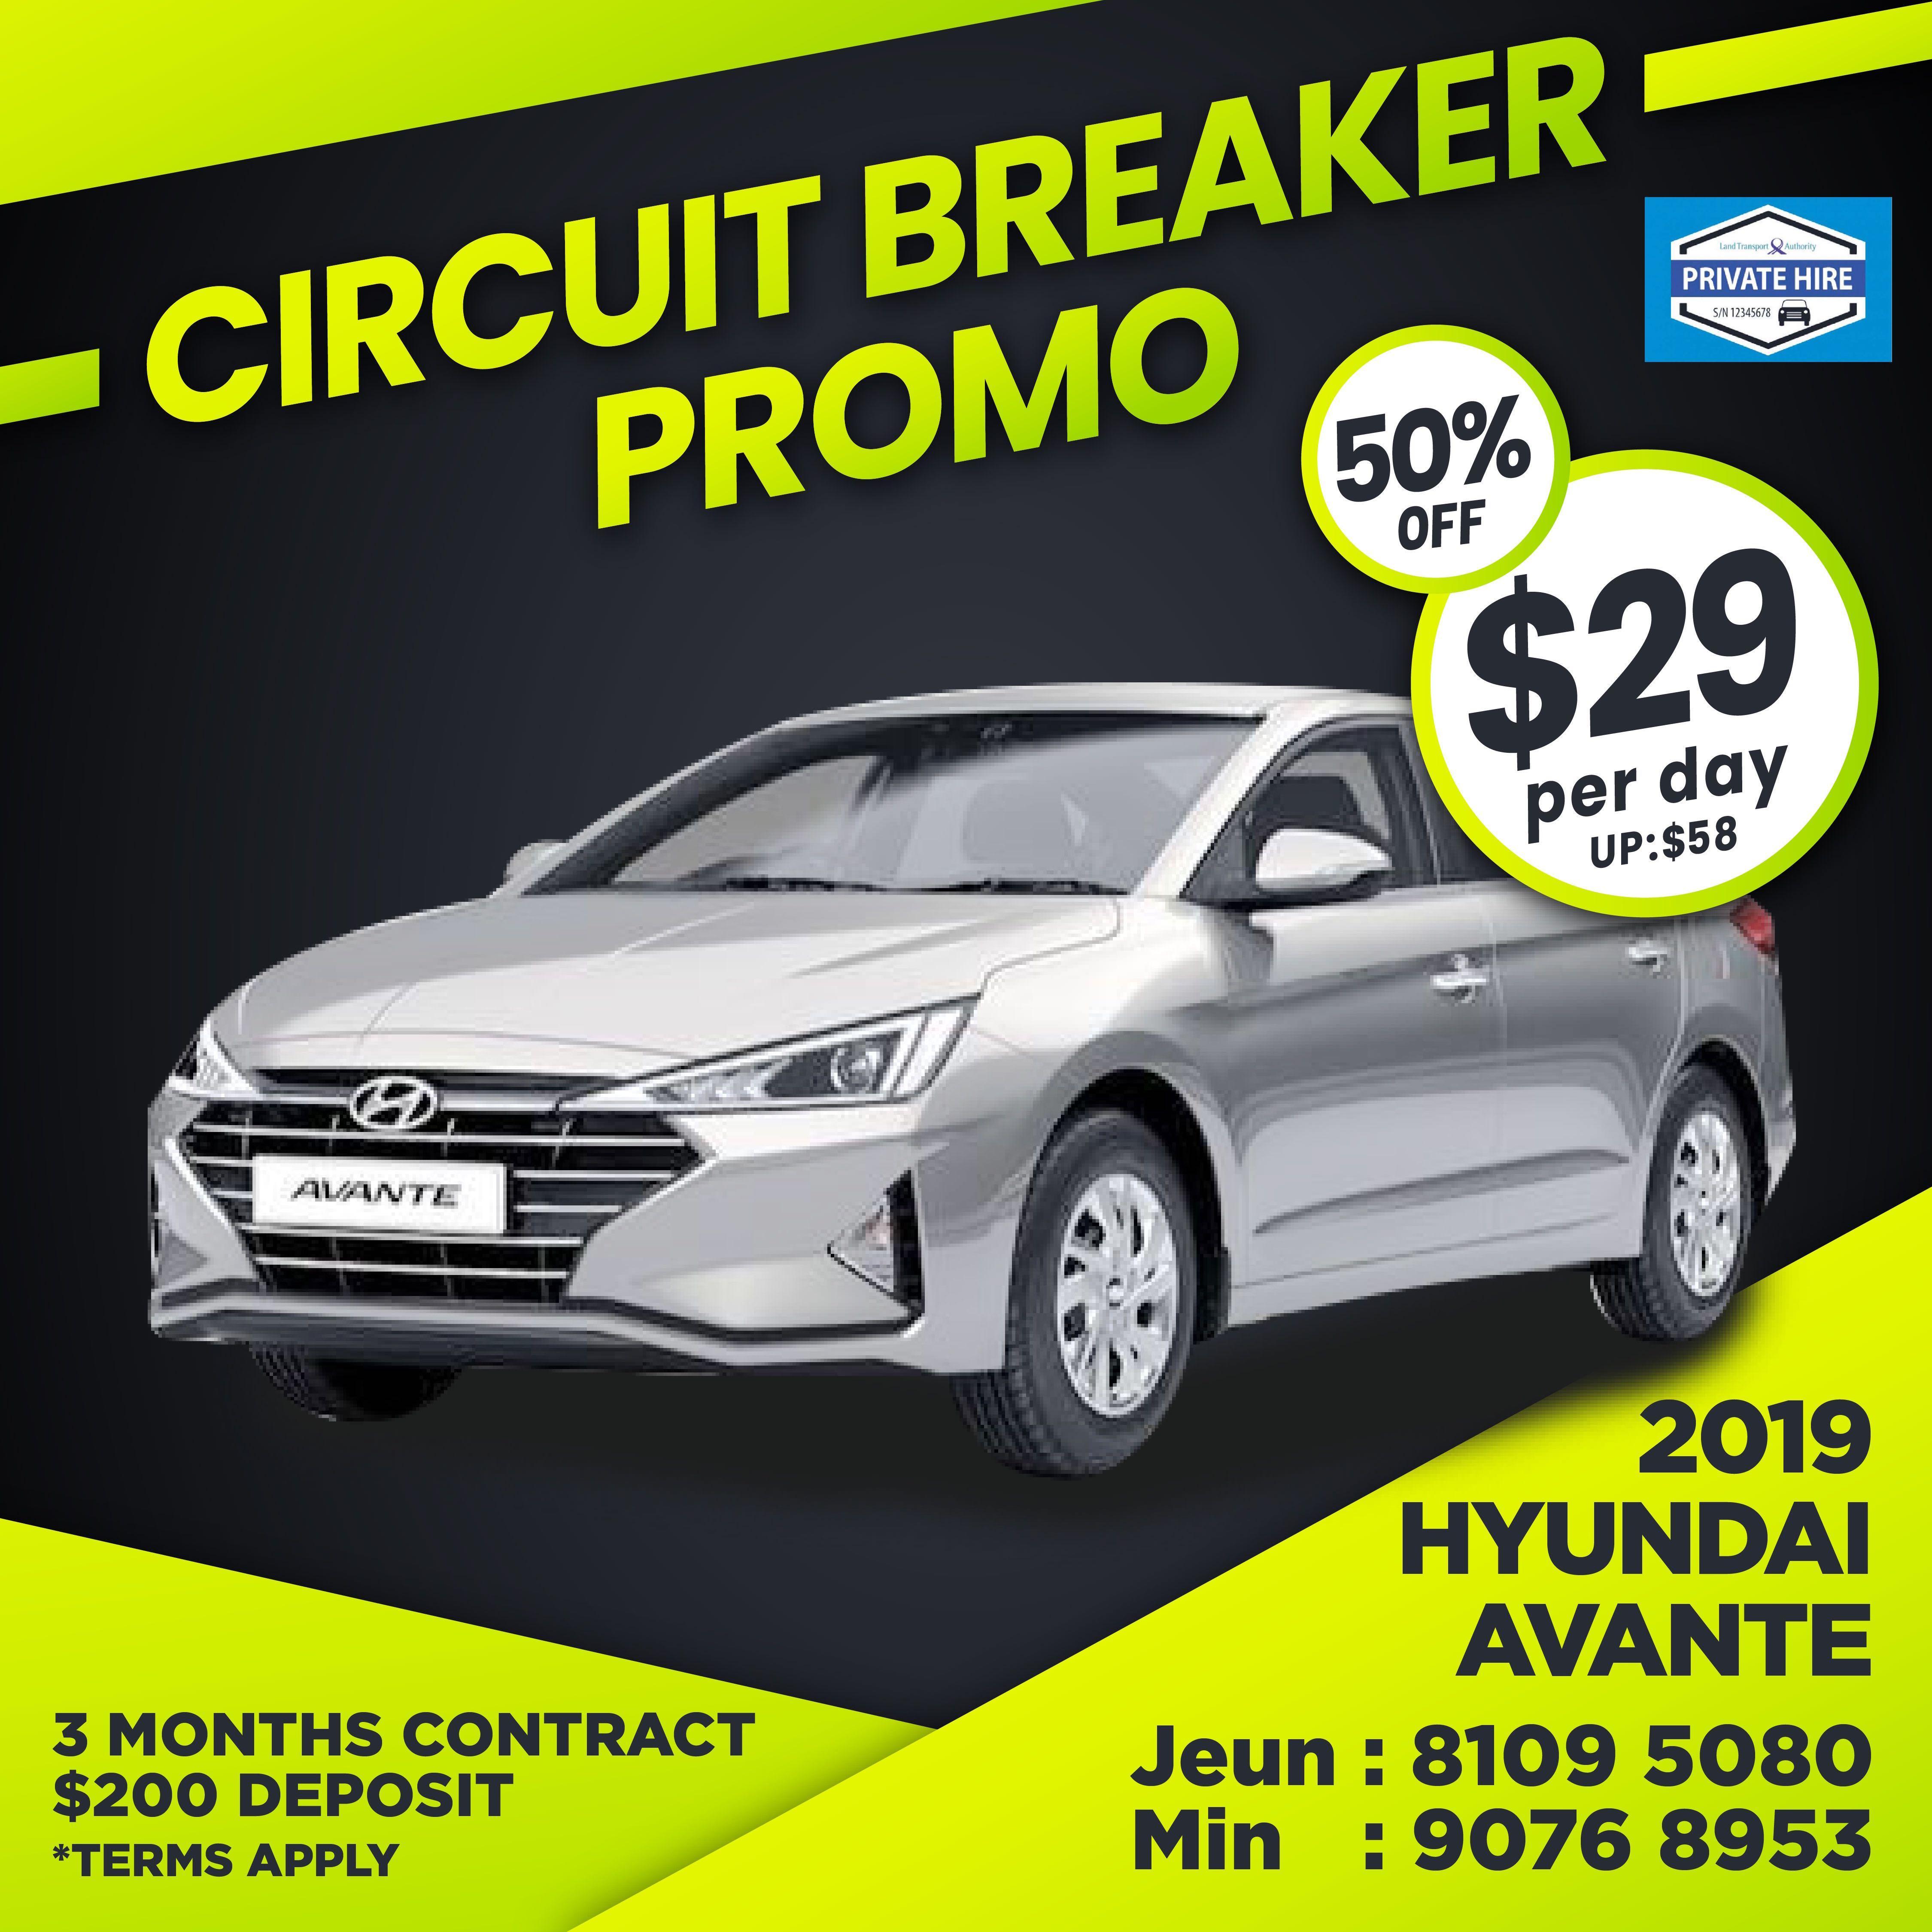 50% OFF - 2019 Hyundai Avante                          ( Grab / PHV Car Rental )